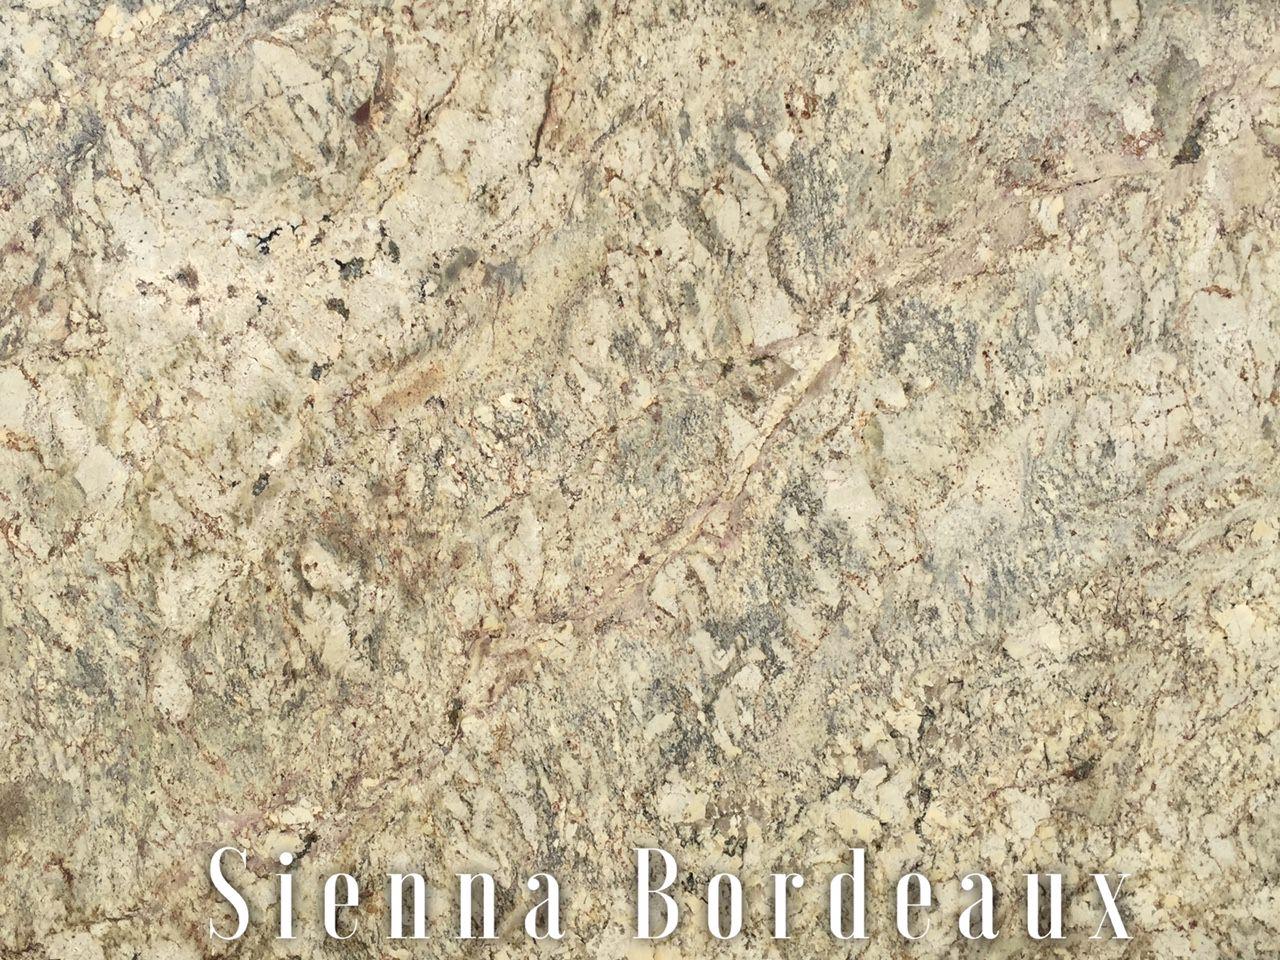 Preferential Sienna Bordeaux Granite Sienna Bordeaux Granite Sienna Bordeaux Granite Price Sienna Bordeaux Granite Kitchen houzz-03 Sienna Bordeaux Granite